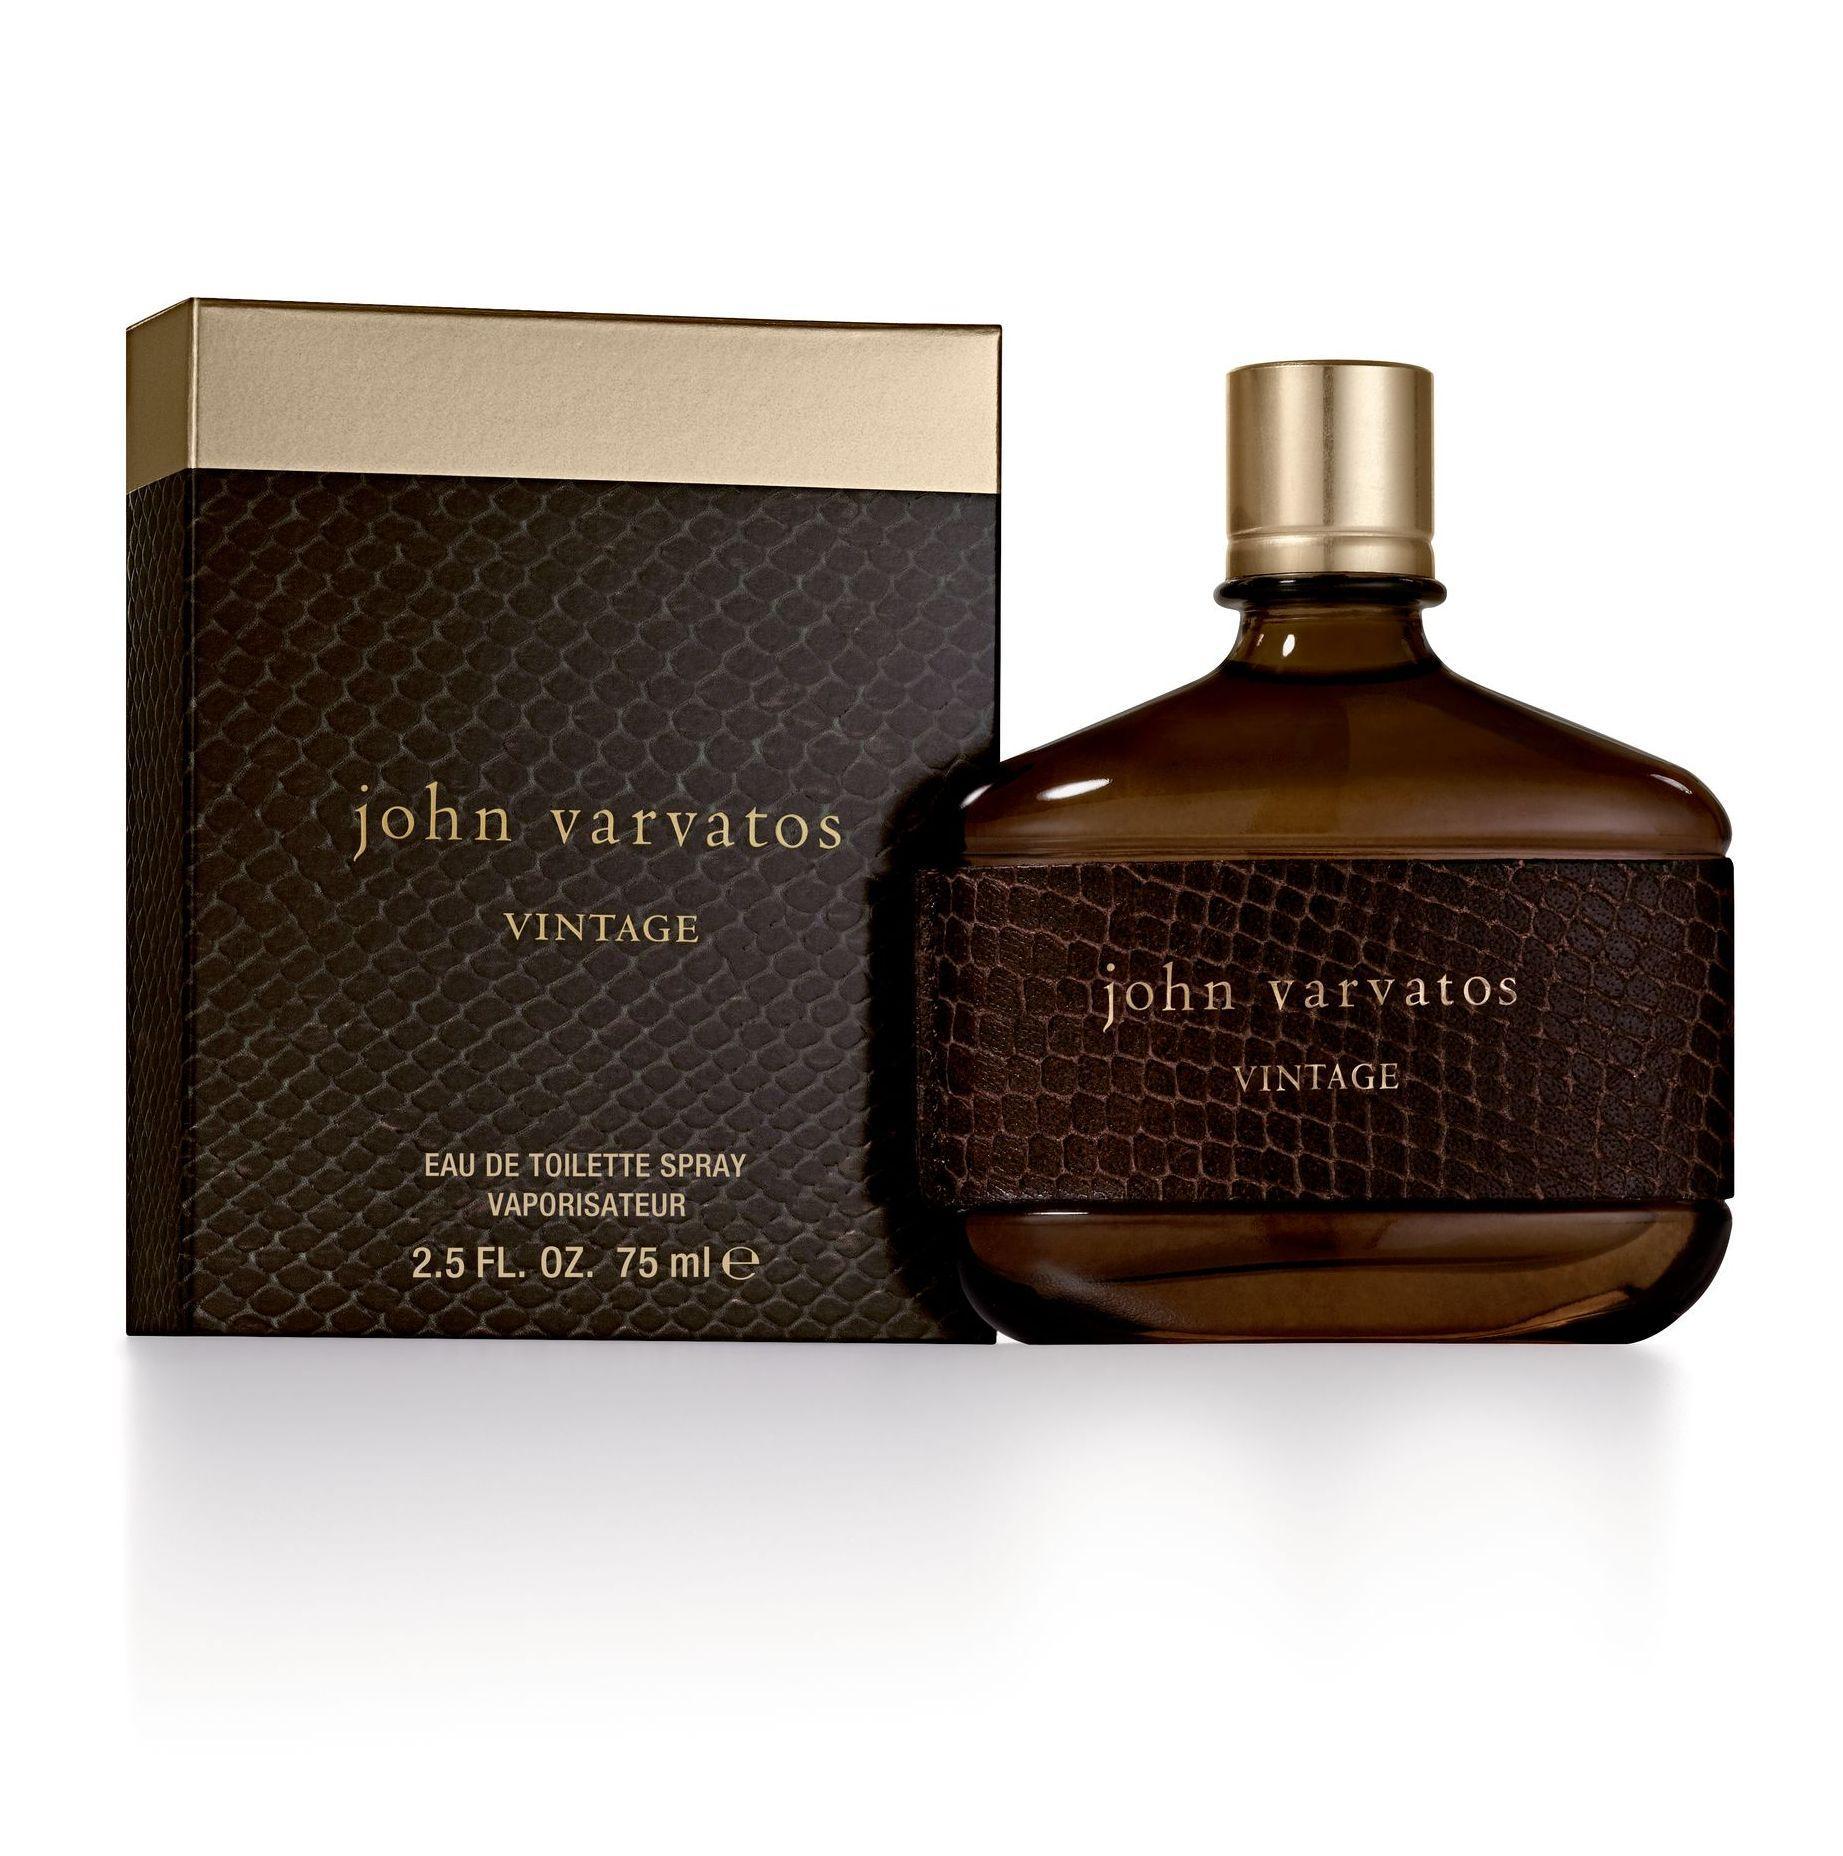 Amazon.com: John Varvatos Vintage Eau de Toilette Spray, 2.5 fl. oz.: JOHN VARVATOS: Luxury Beauty